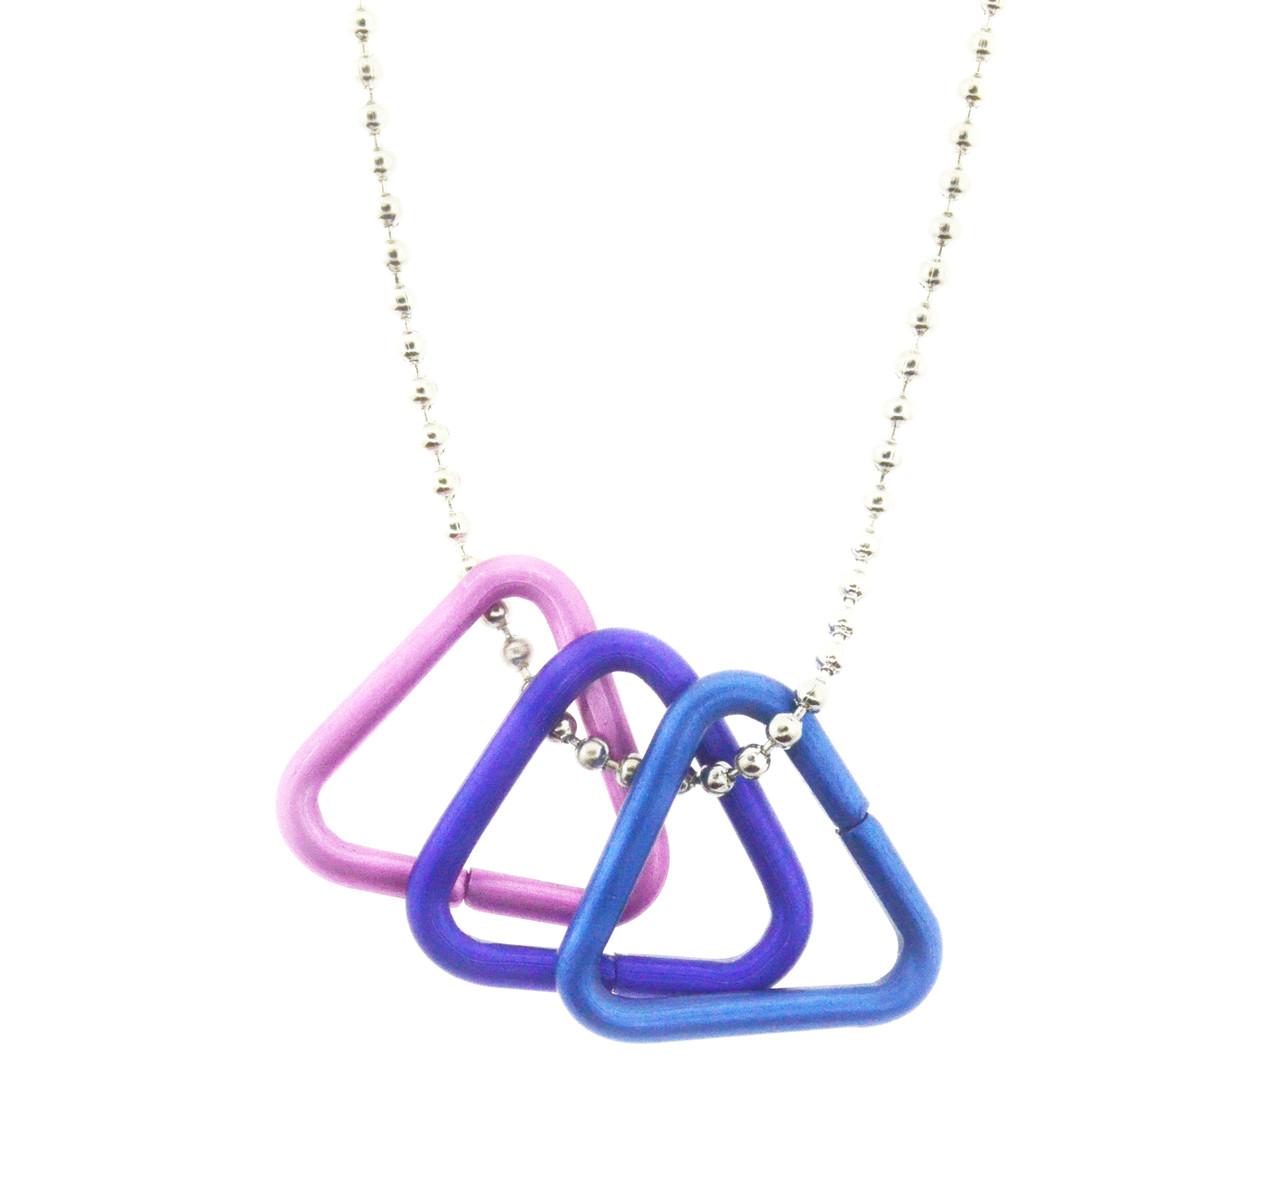 Bi Pride Freedom Triangle Necklace - Bisexual LGBT Pride Chain